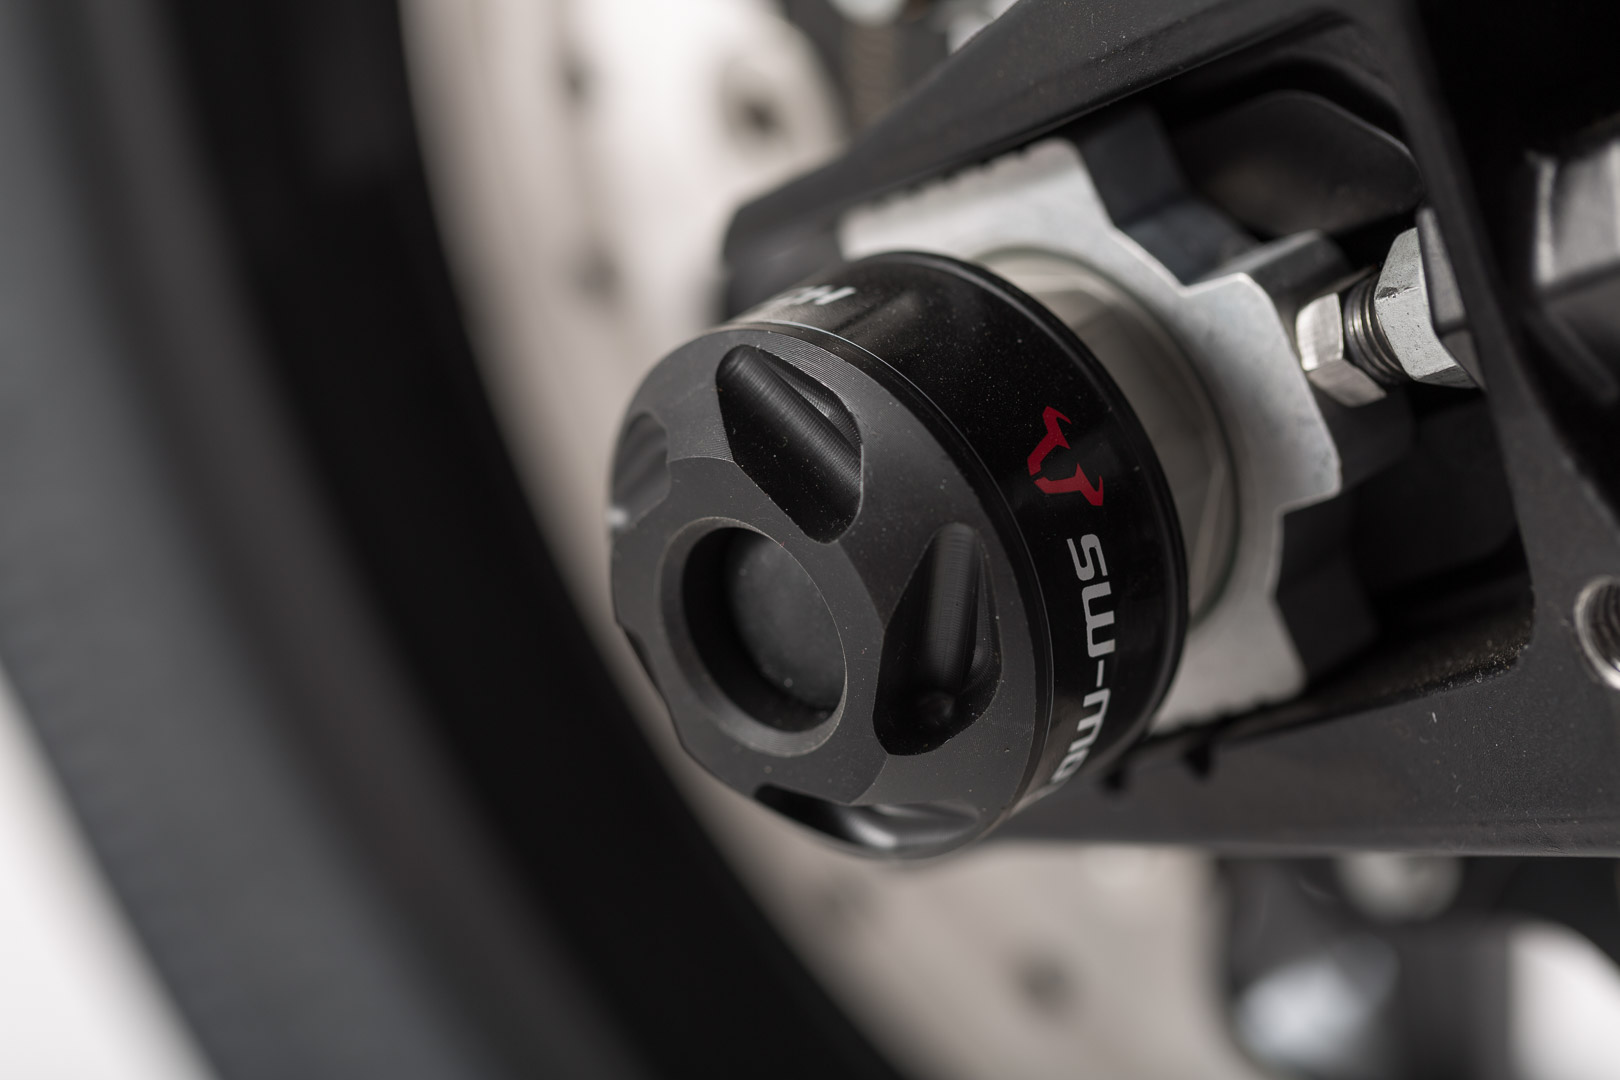 Slider set for rear axle KTM 1050/1090/1190 Adv / 1290 SAdv